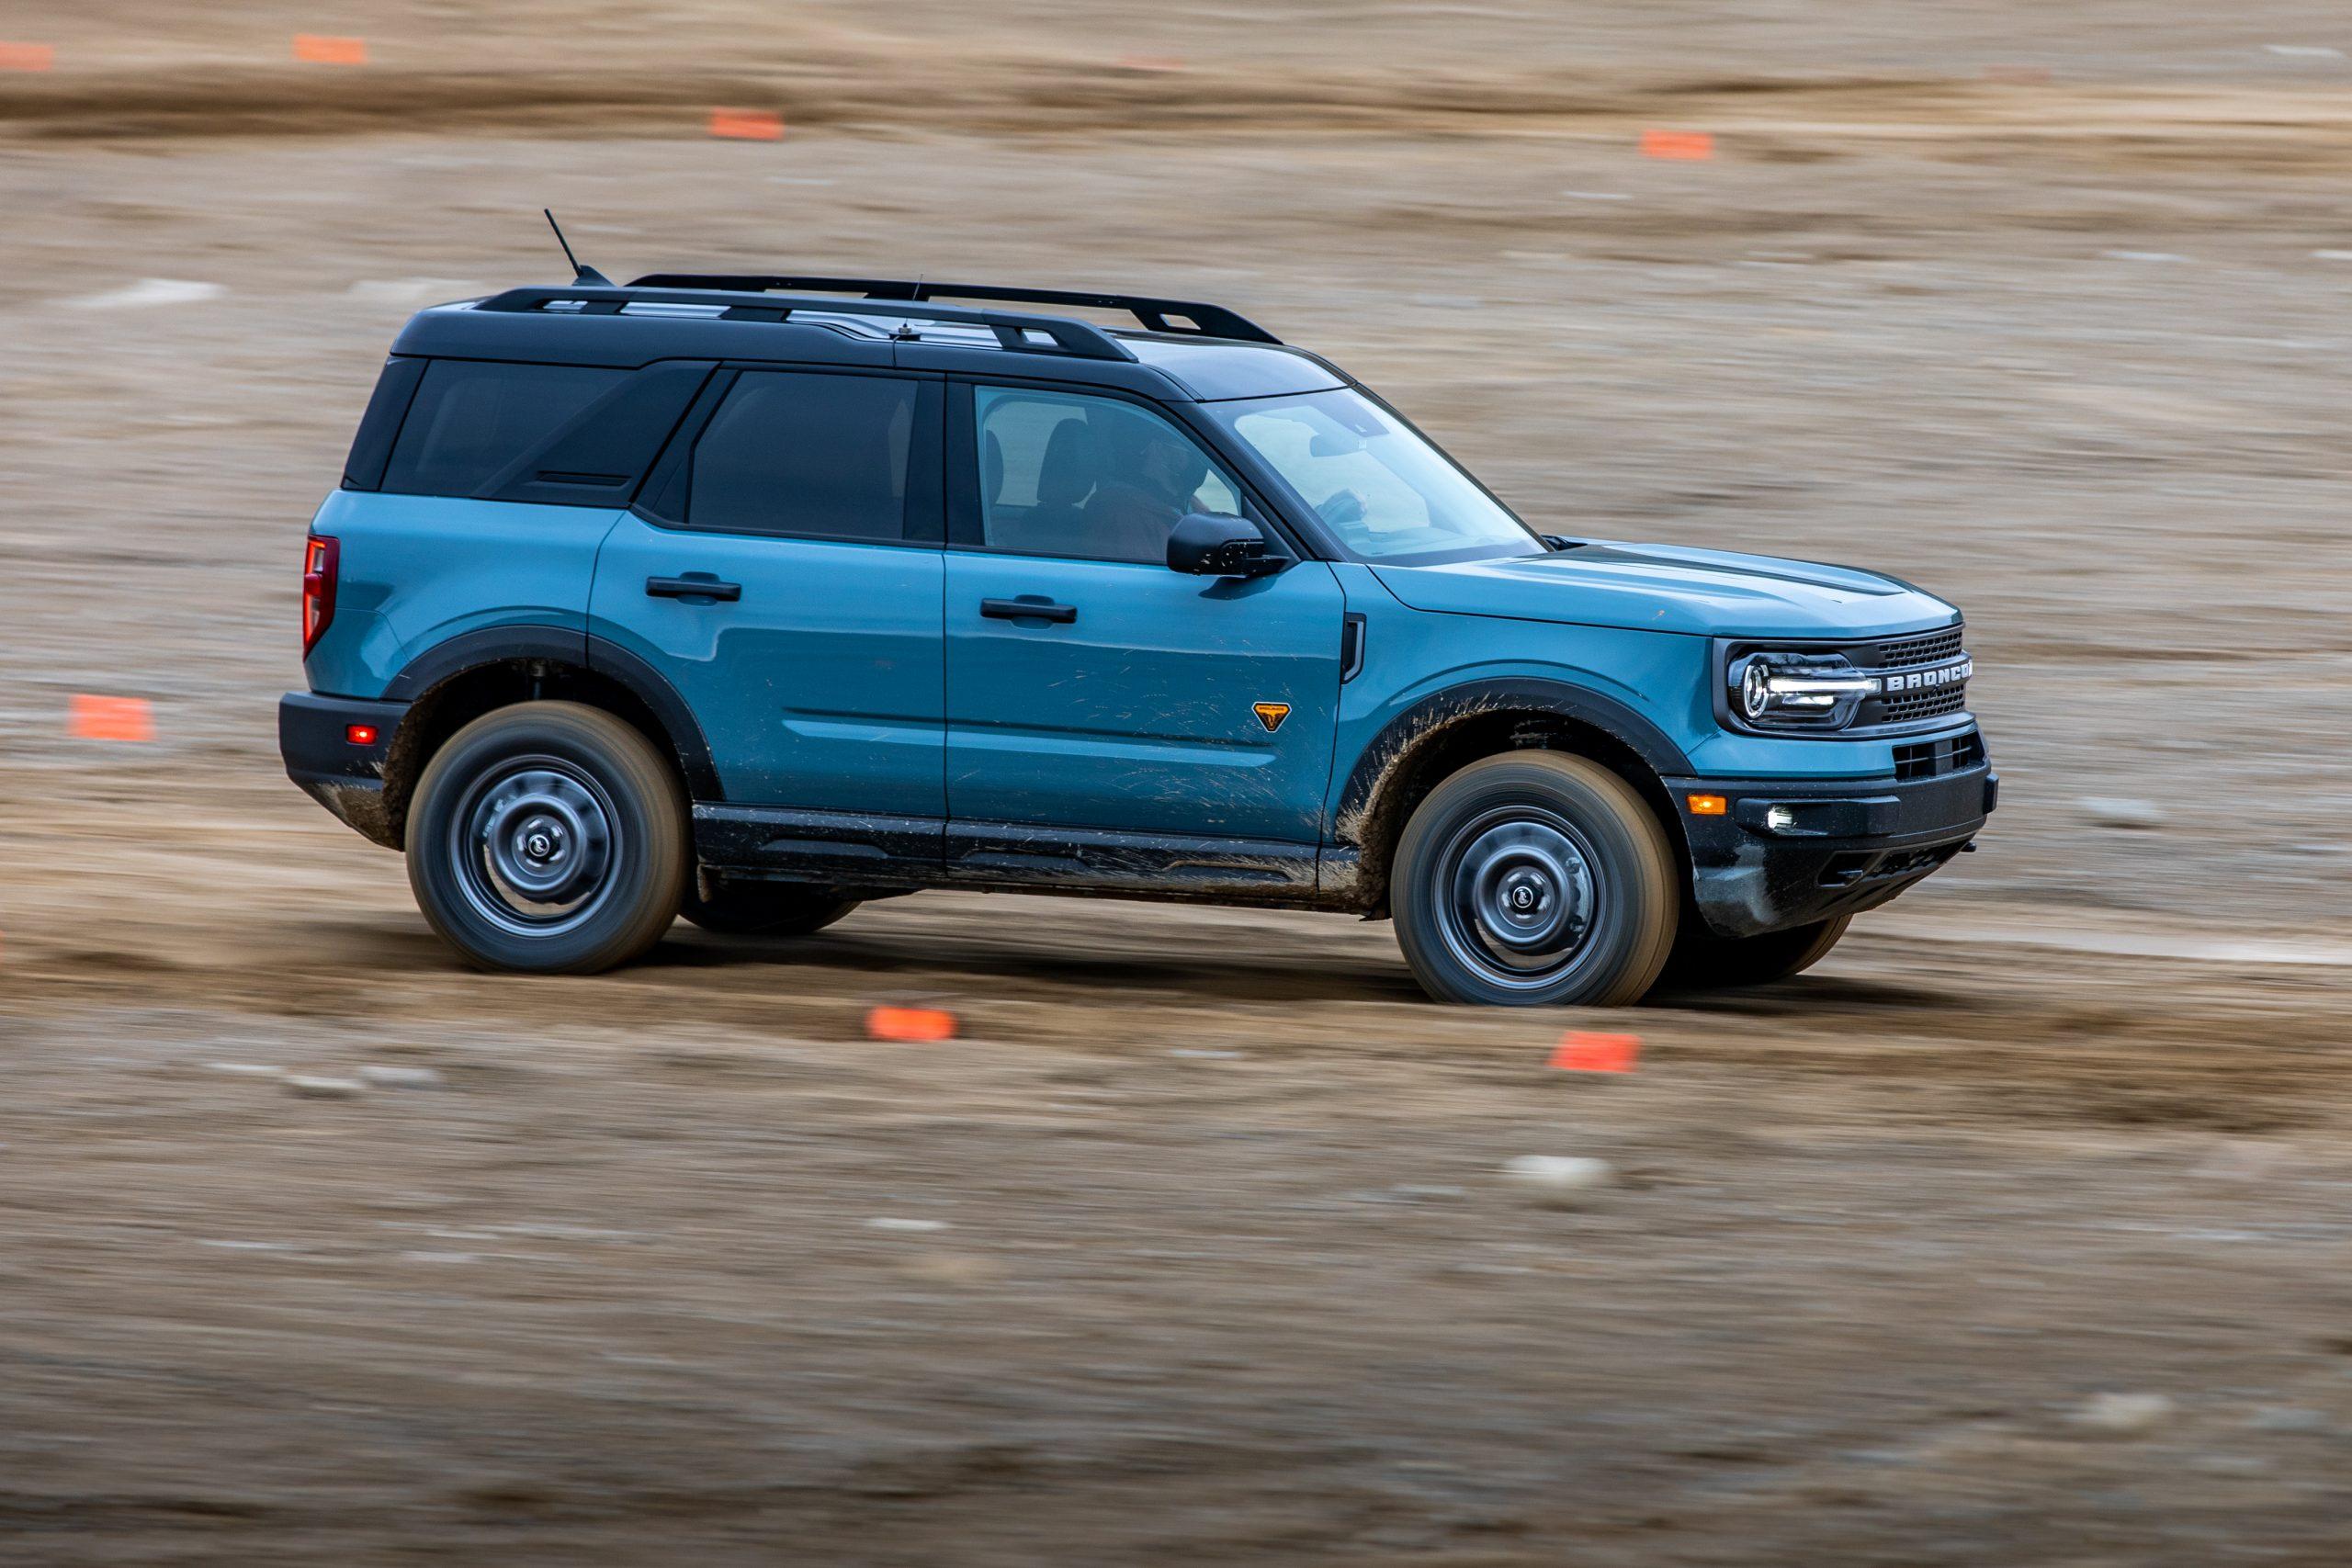 2021 Bronco Sport side profile dirtcross